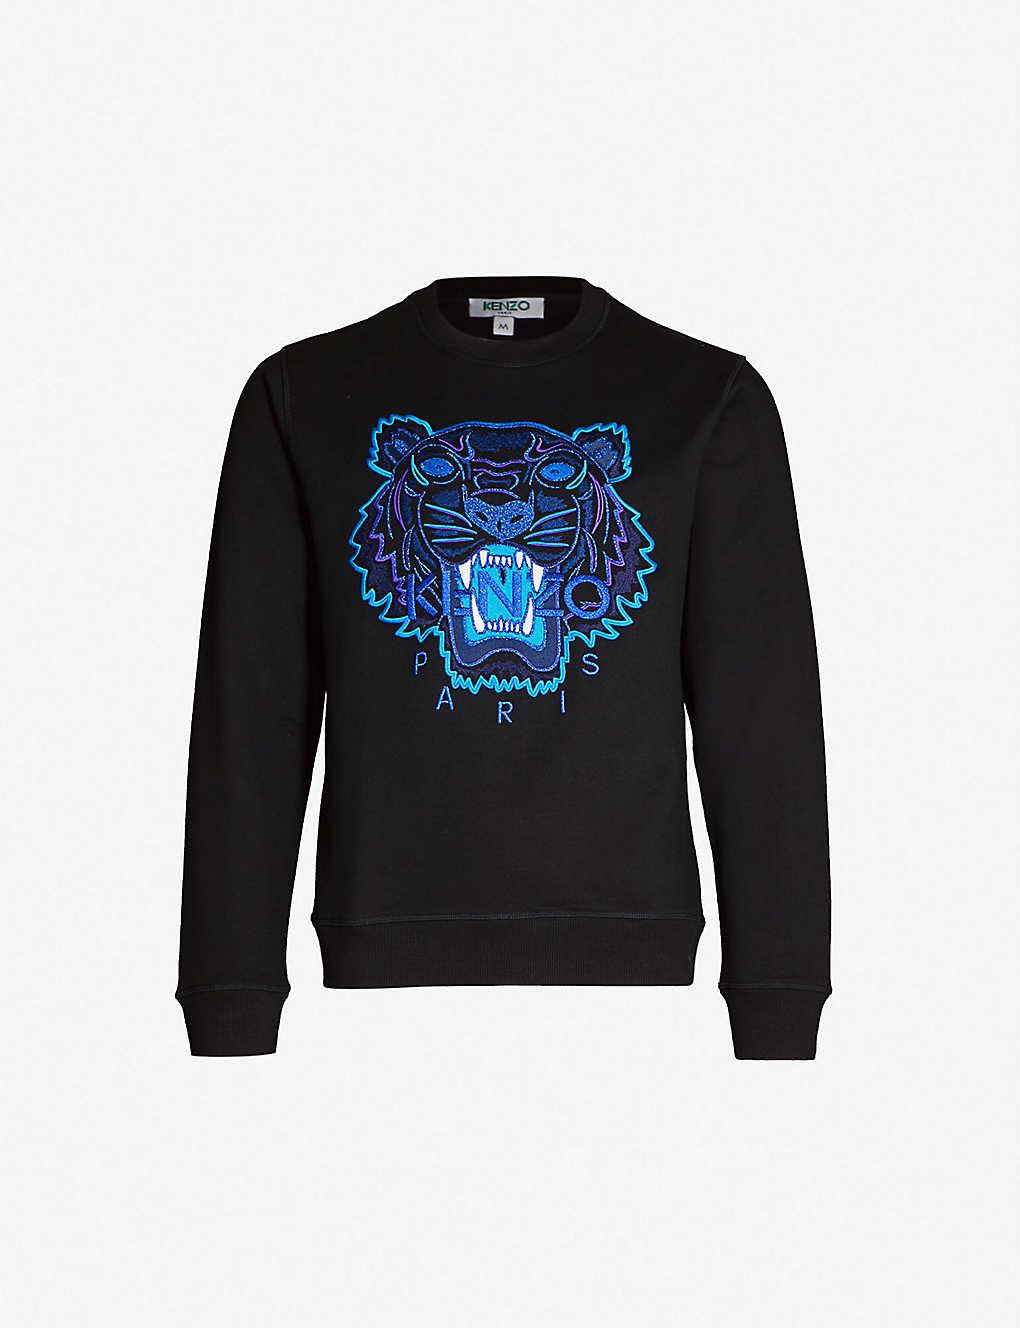 ff8afb30 KENZO - Metallic tiger-embroidered cotton-jersey sweatshirt ...